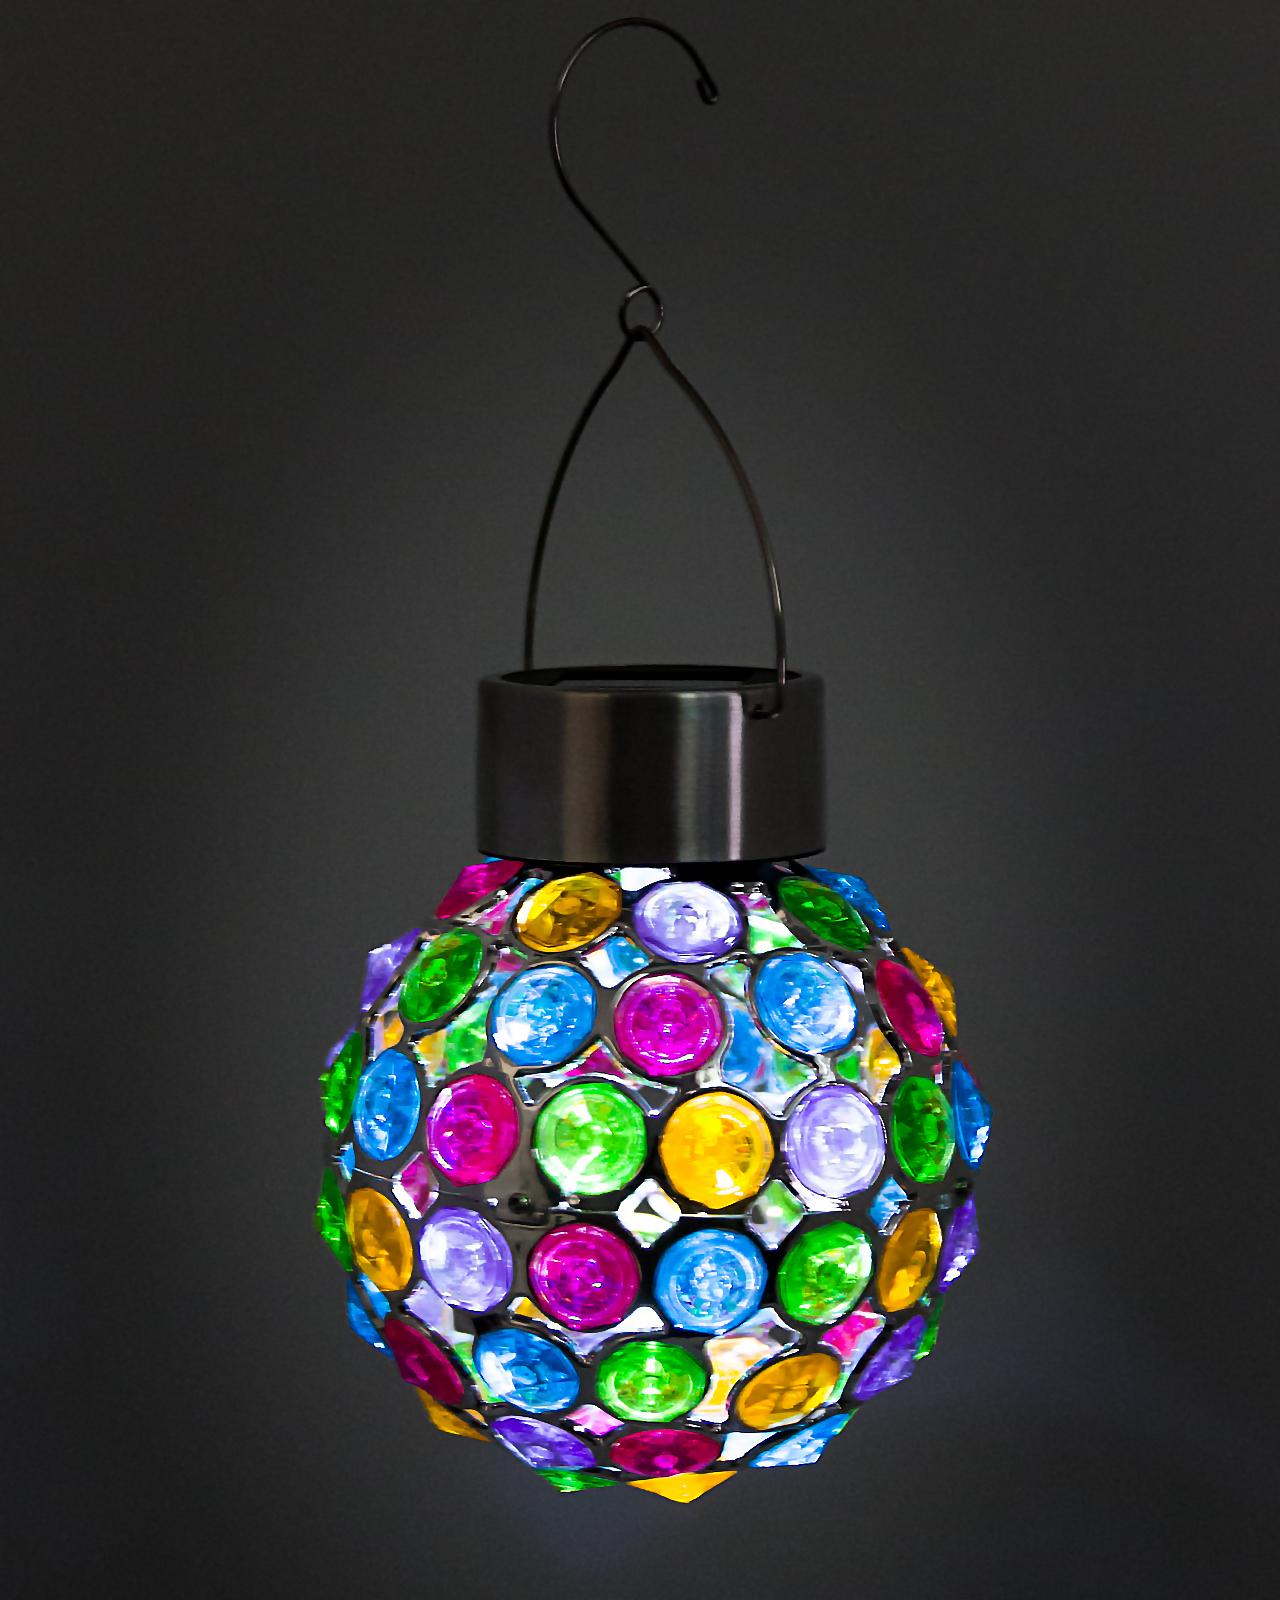 GreenLighting Outdoor Solar Hanging Lights Decorative Ball ...